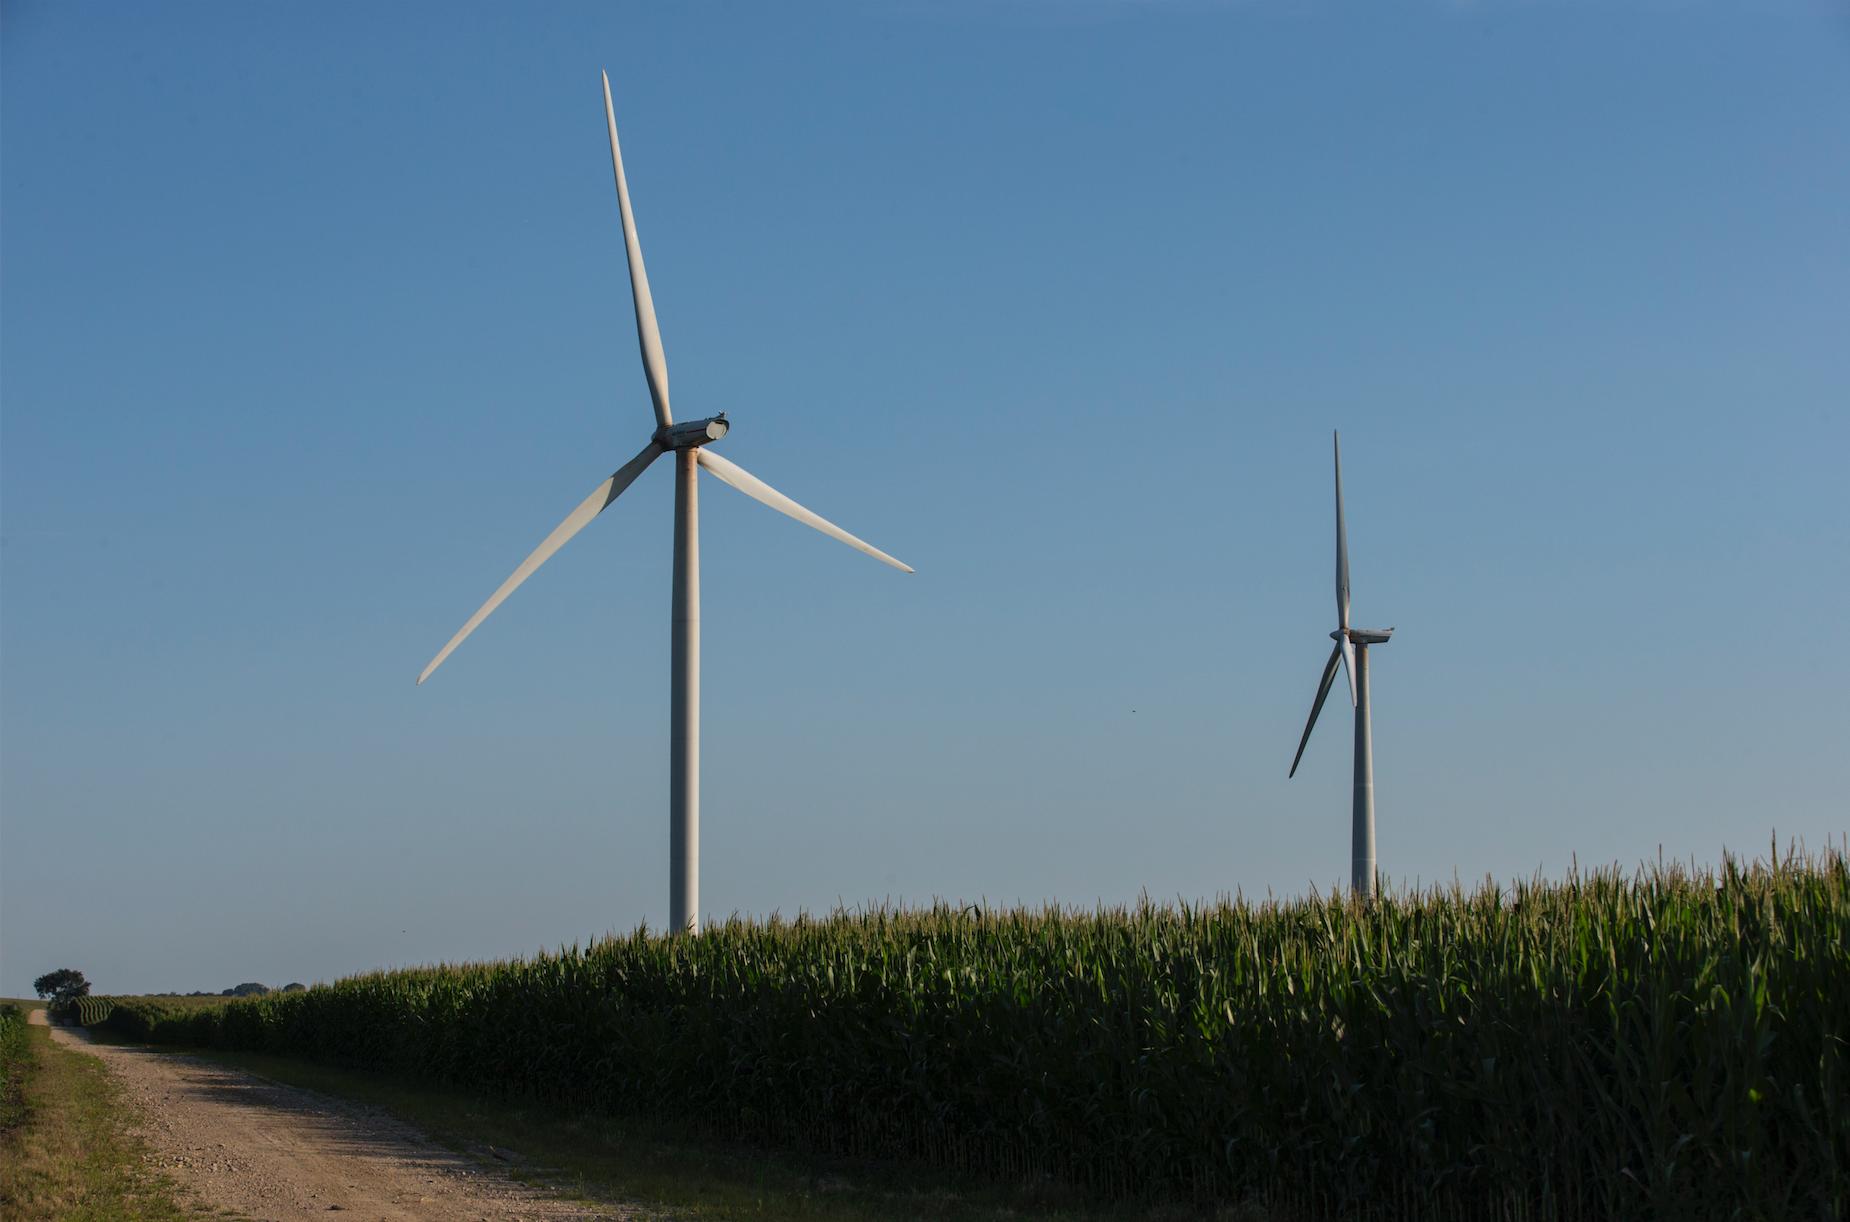 The Pioneer Grove Wind Farm is seen in Mechanicsville, Iowa on Wednesday, July 11, 2018. (Nick Rohlman/The Daily Iowan)